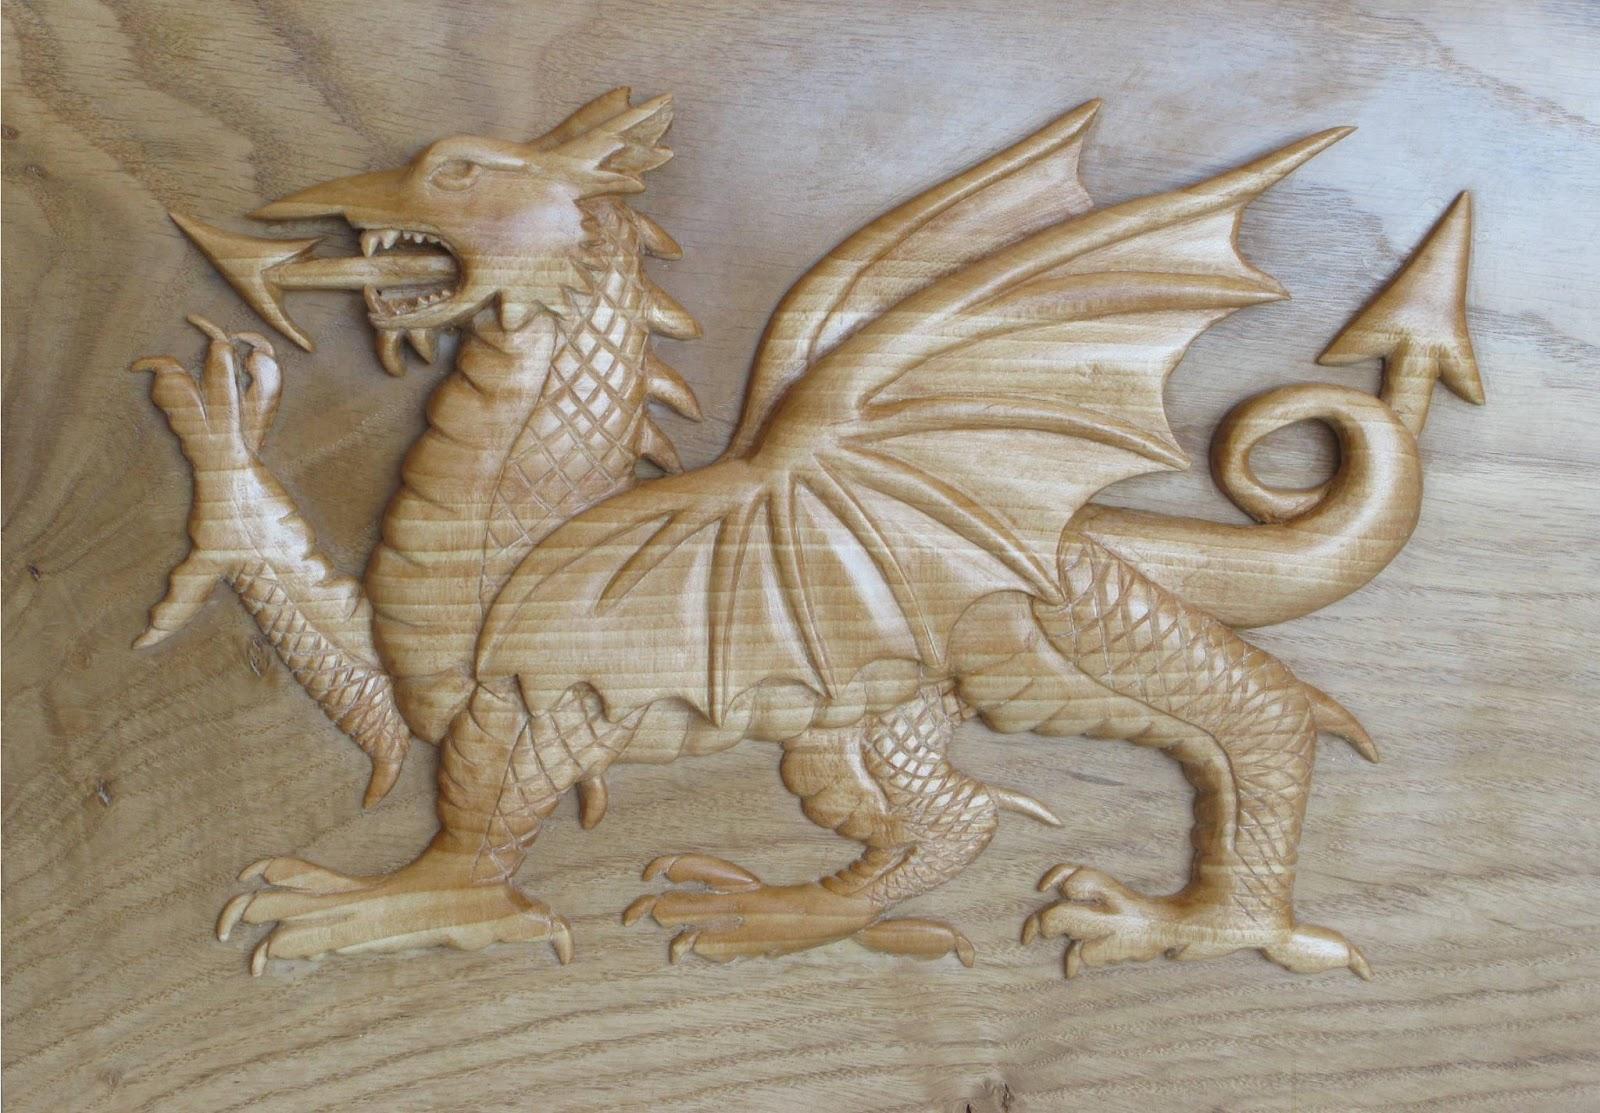 David ware woodcarving